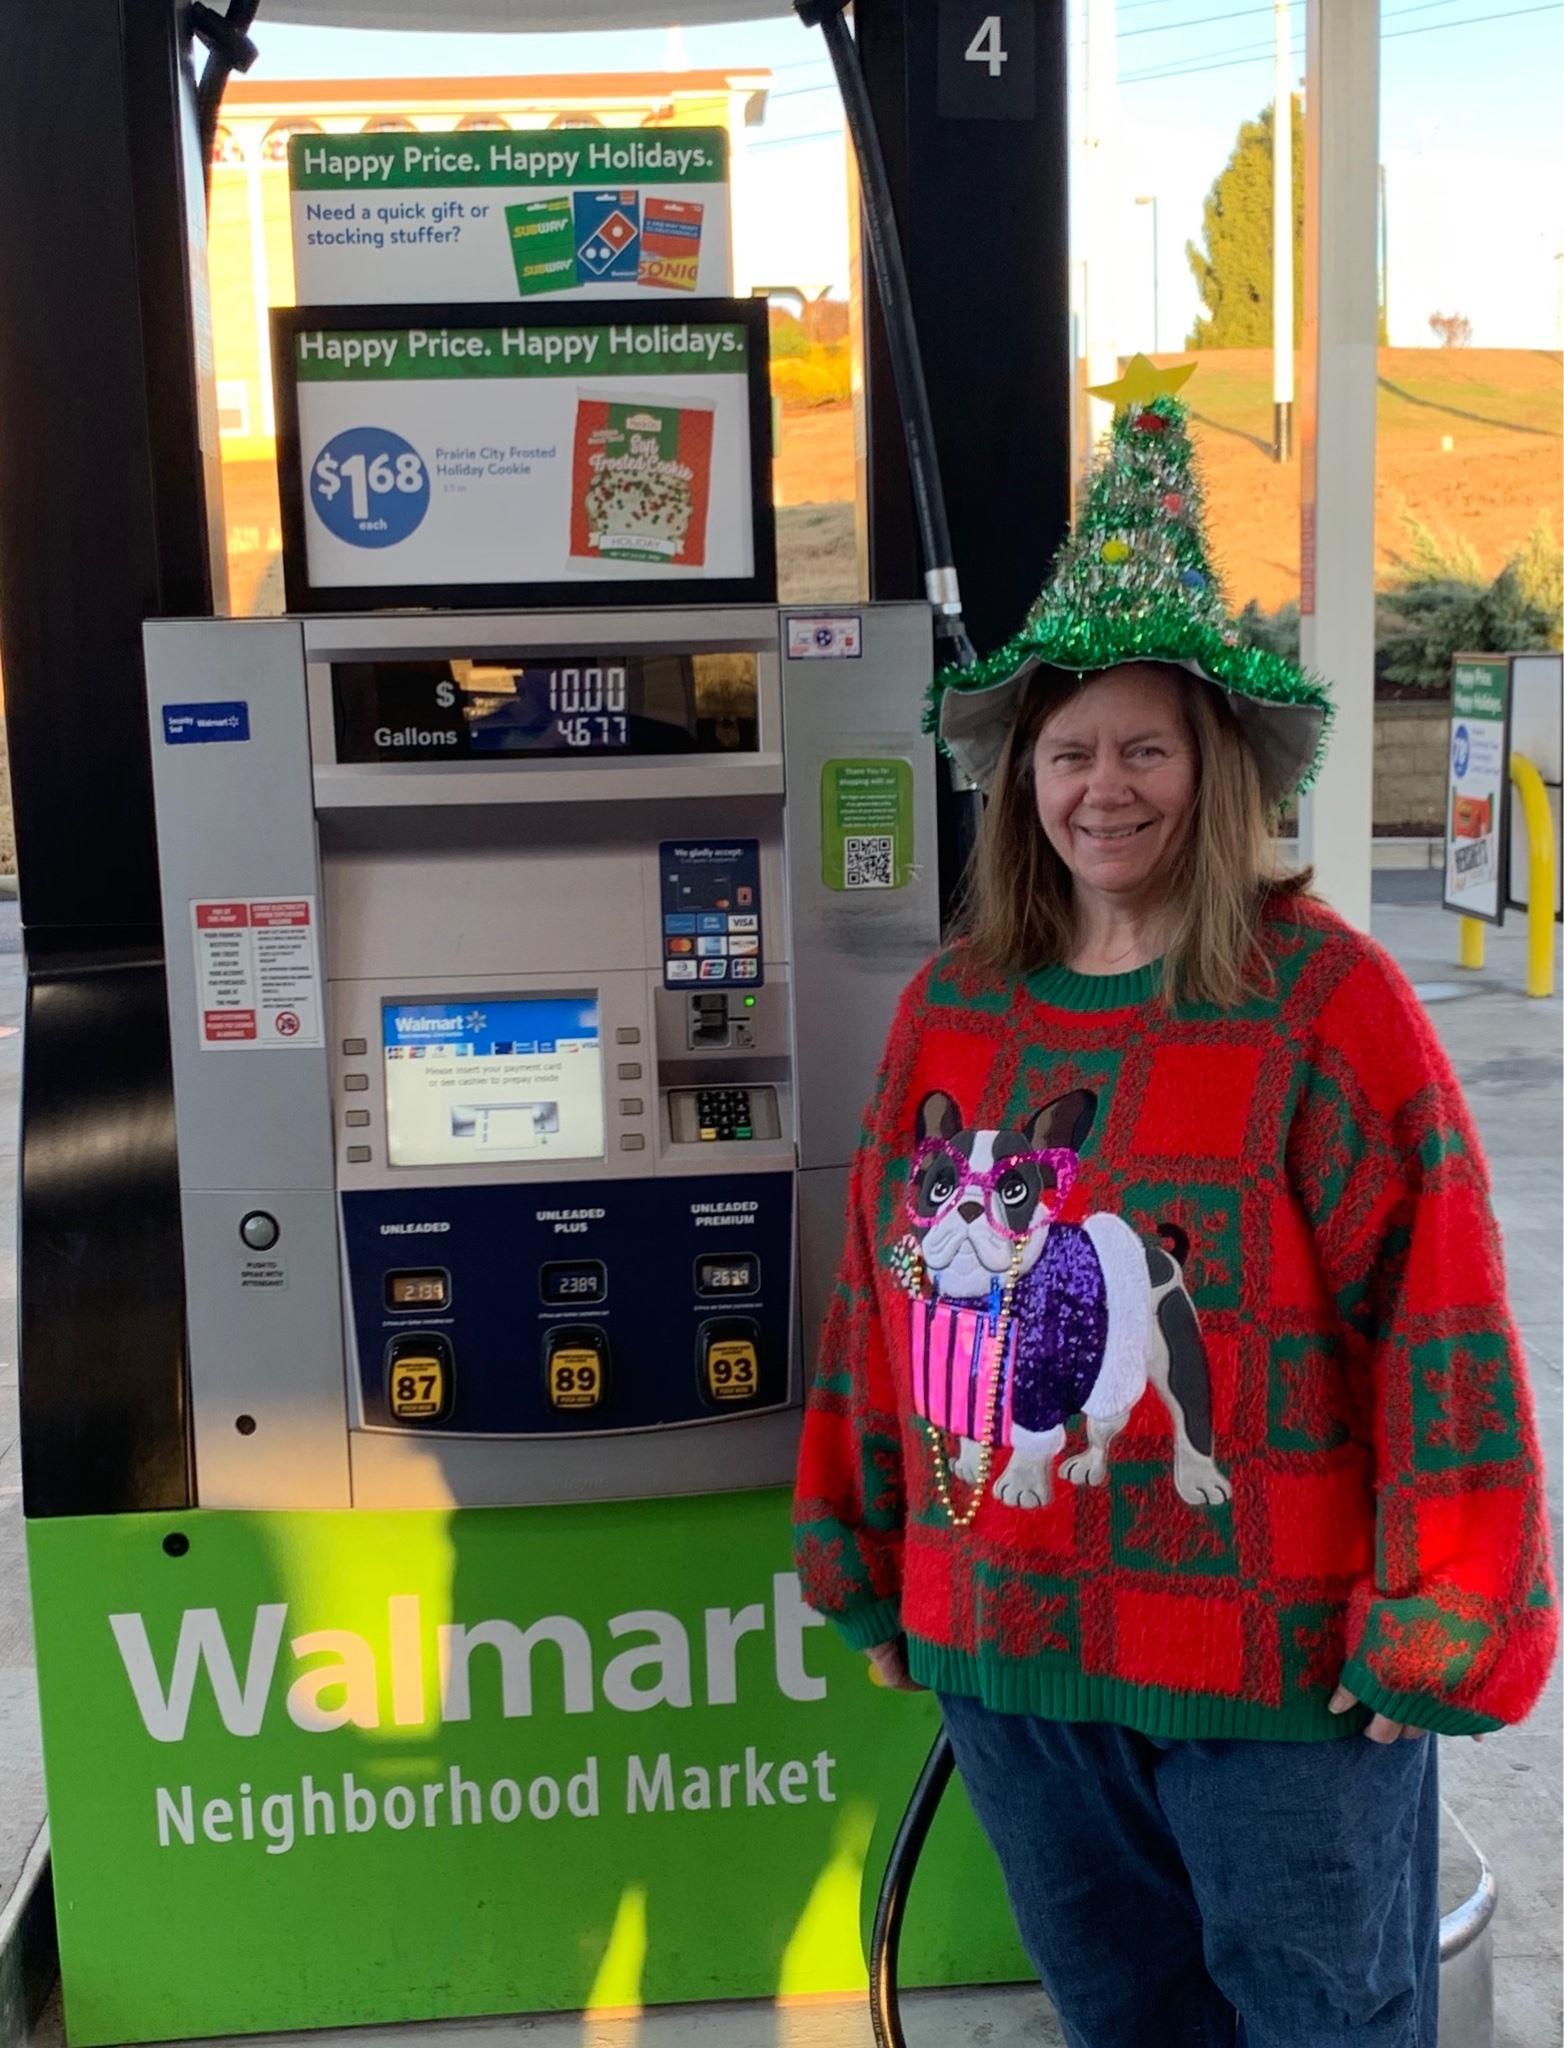 Walmart Gas Station 3120 McKamey Rd, Knoxville